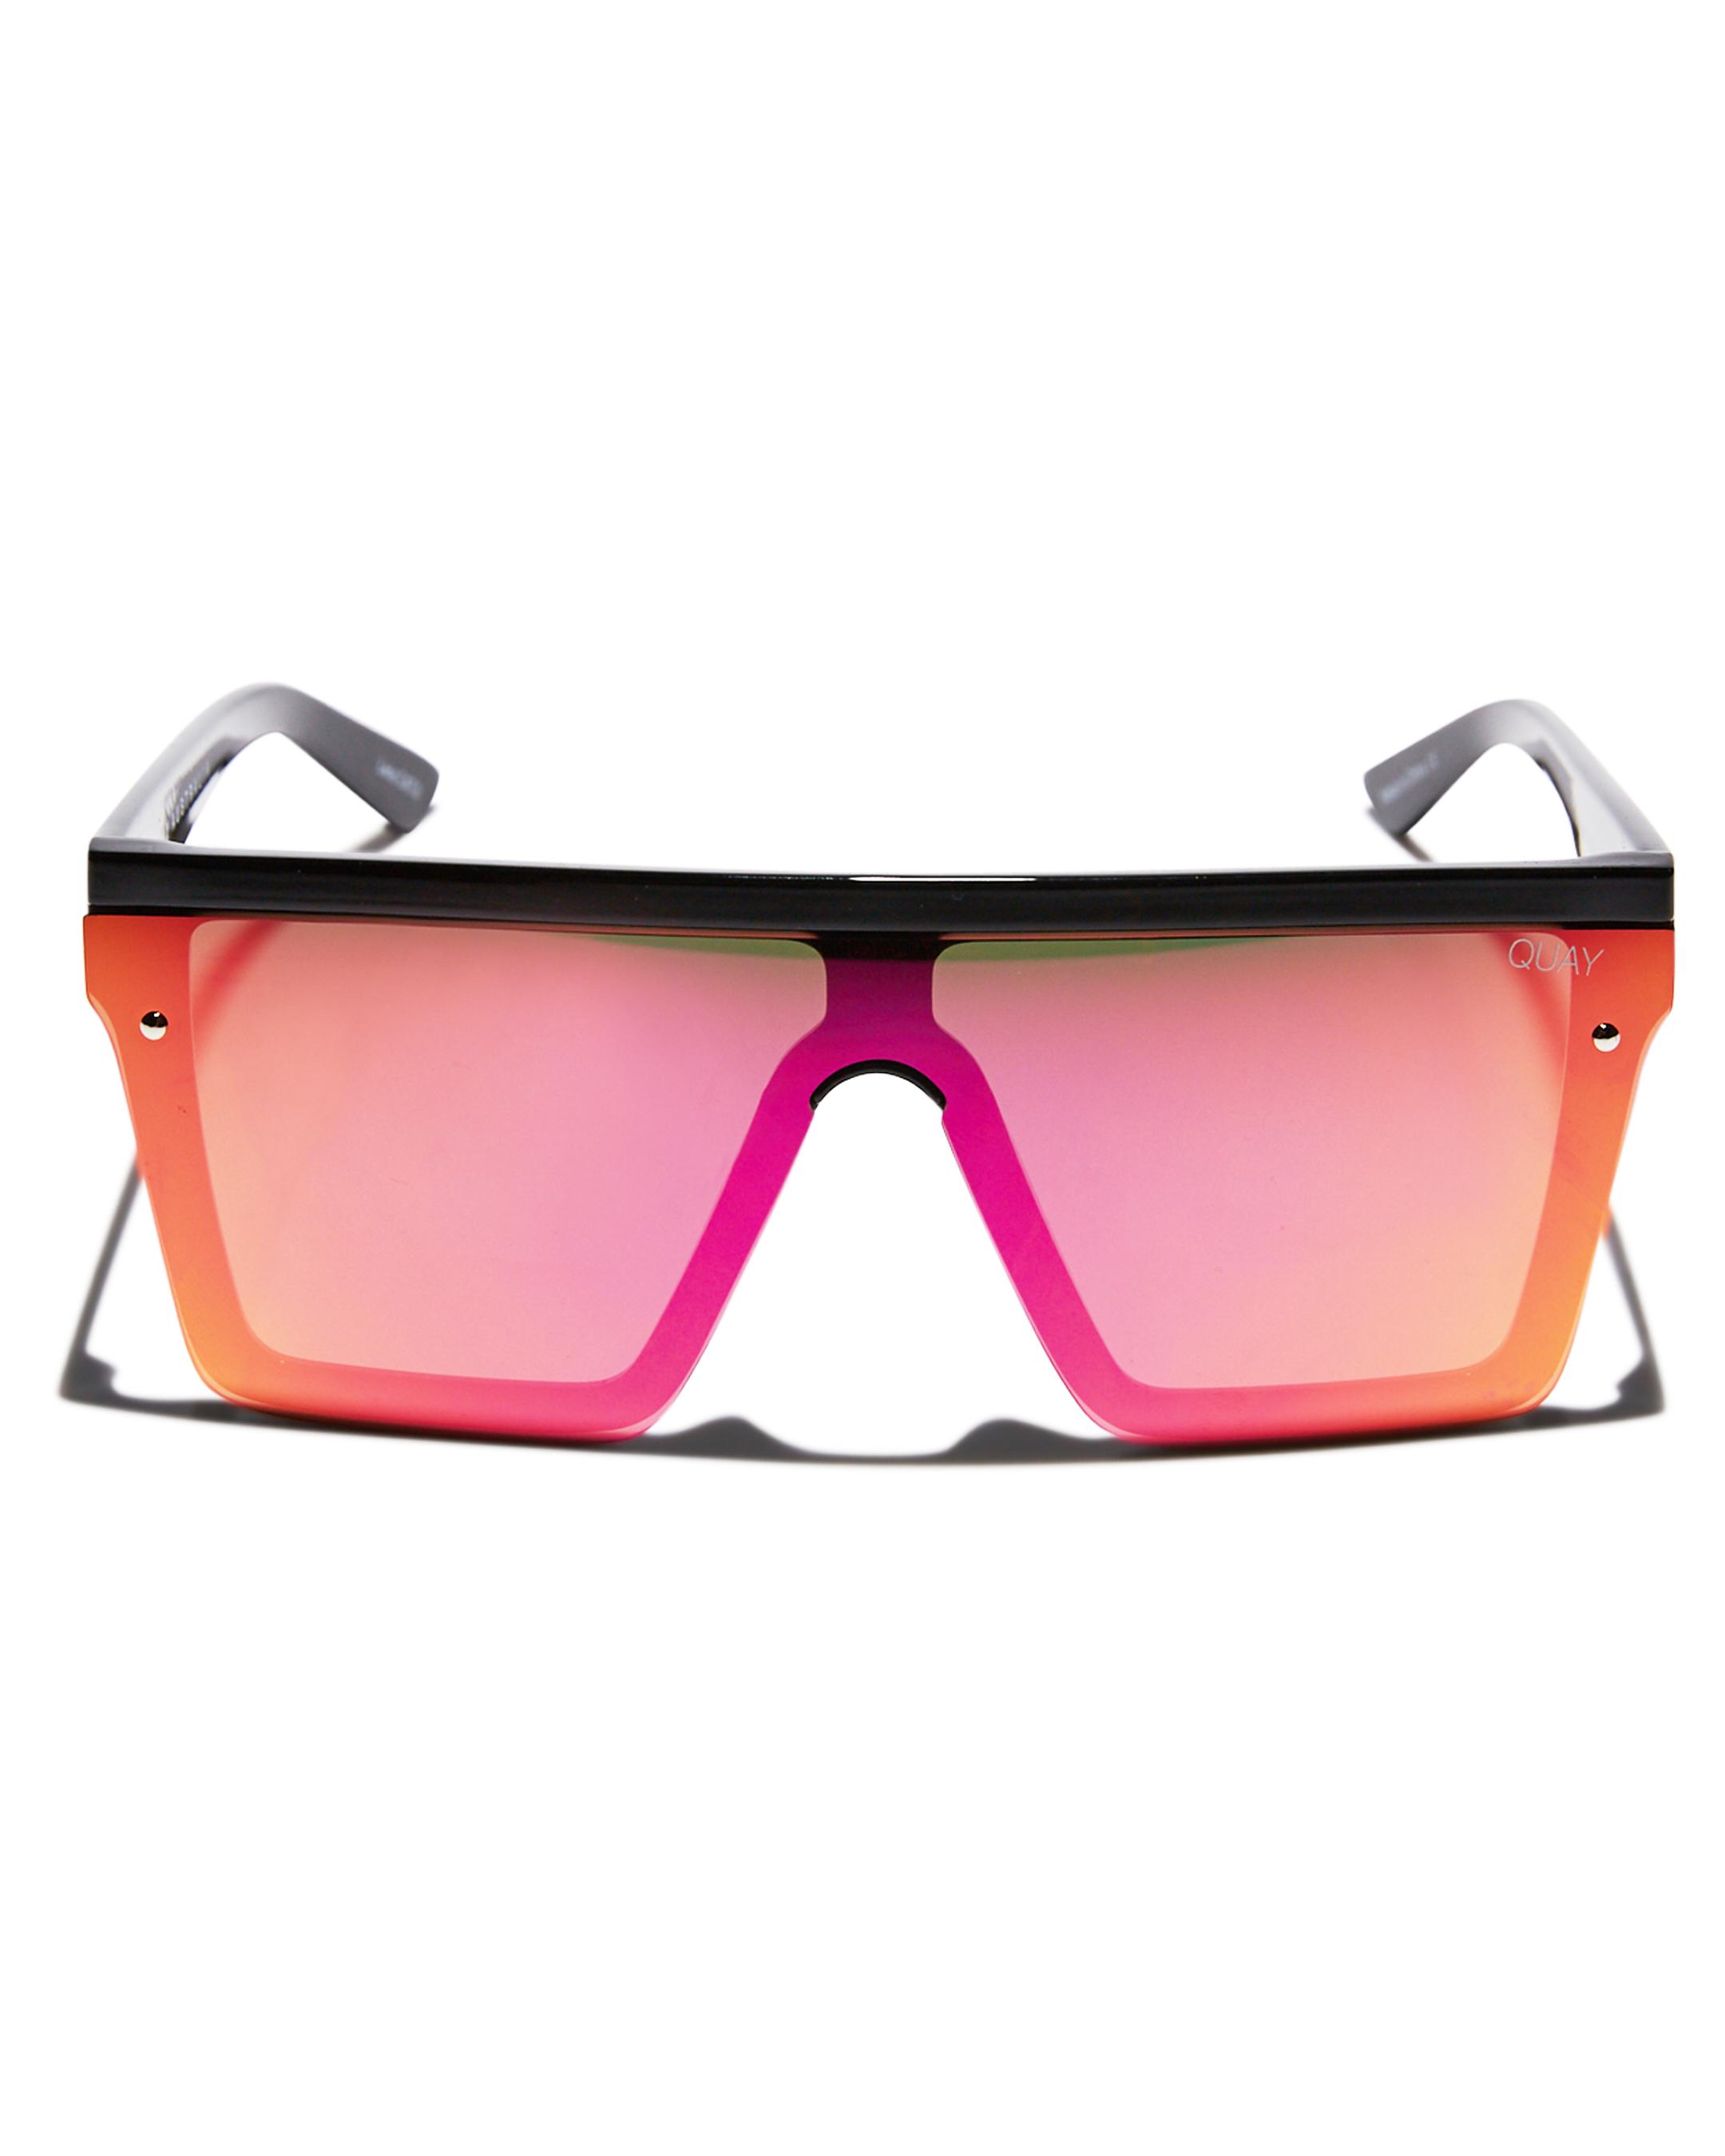 New-Quay-Eyewear-Women-039-s-Hindsight-Sunglasses-Stainless-Steel-Glass-Pink thumbnail 12